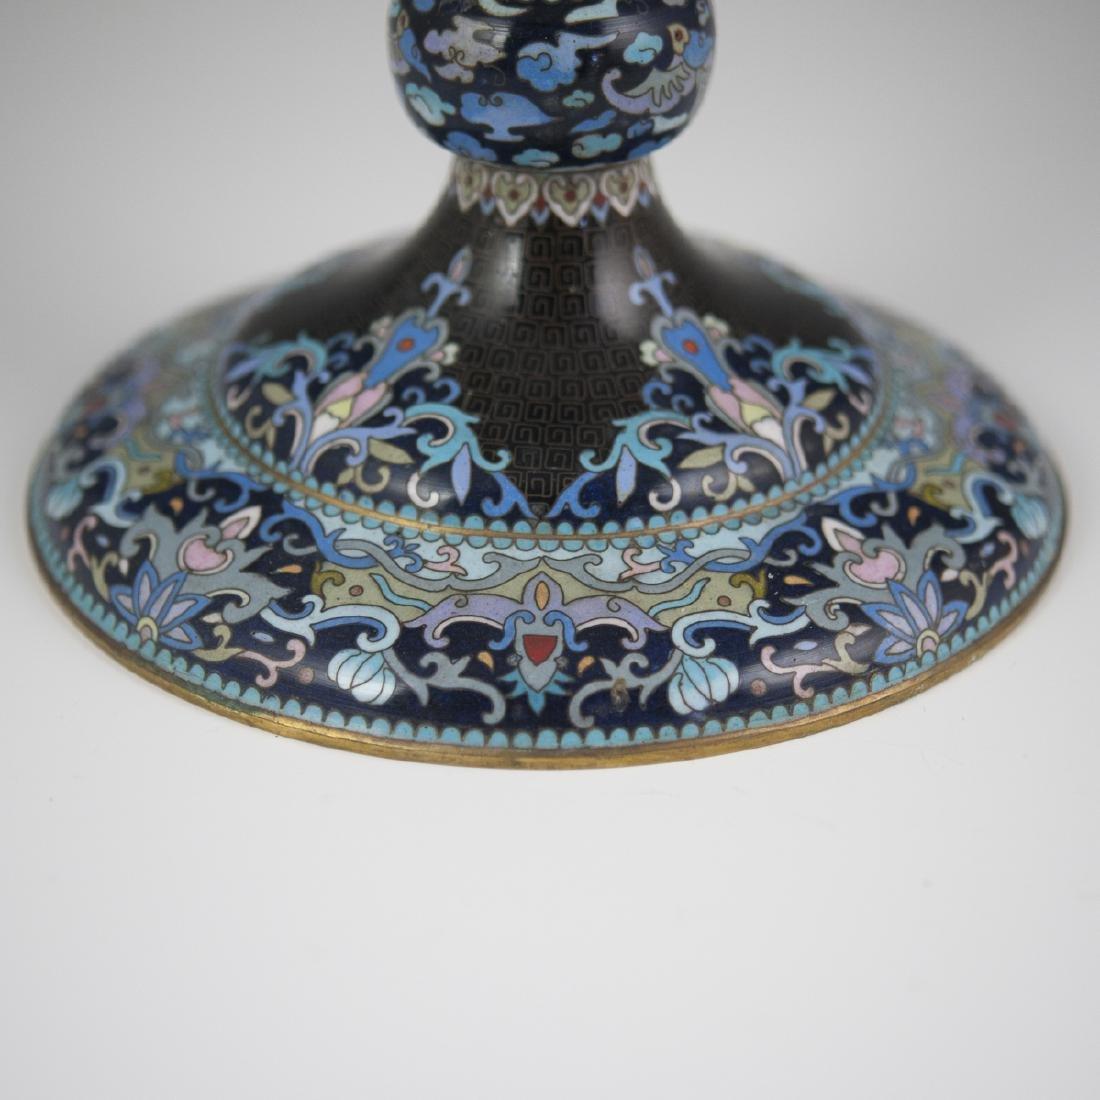 Chinese Cloisonne Enameled Vanity Mirror - 4